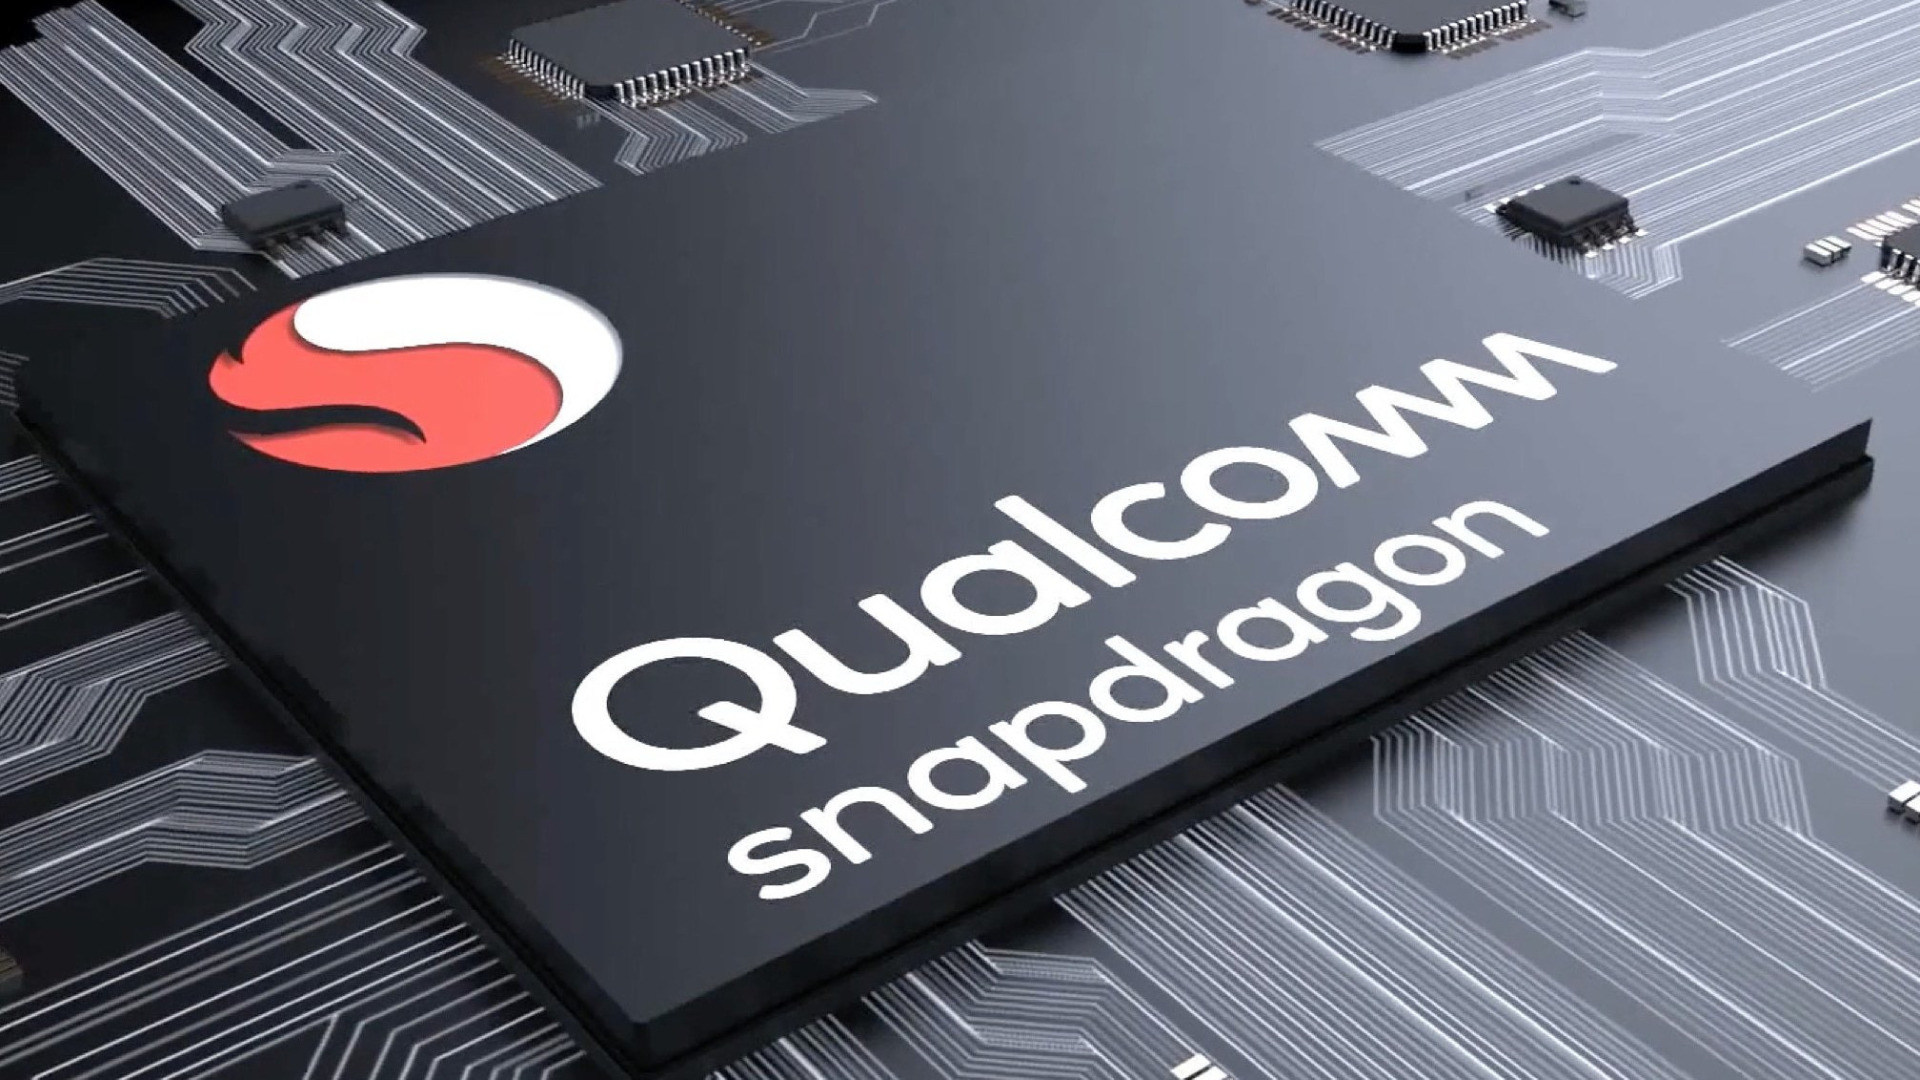 Smartphone, Prozessor, Cpu, Chip, SoC, Arm, Qualcomm, Gpu, 5G, Snapdragon, Qualcomm Snapdragon